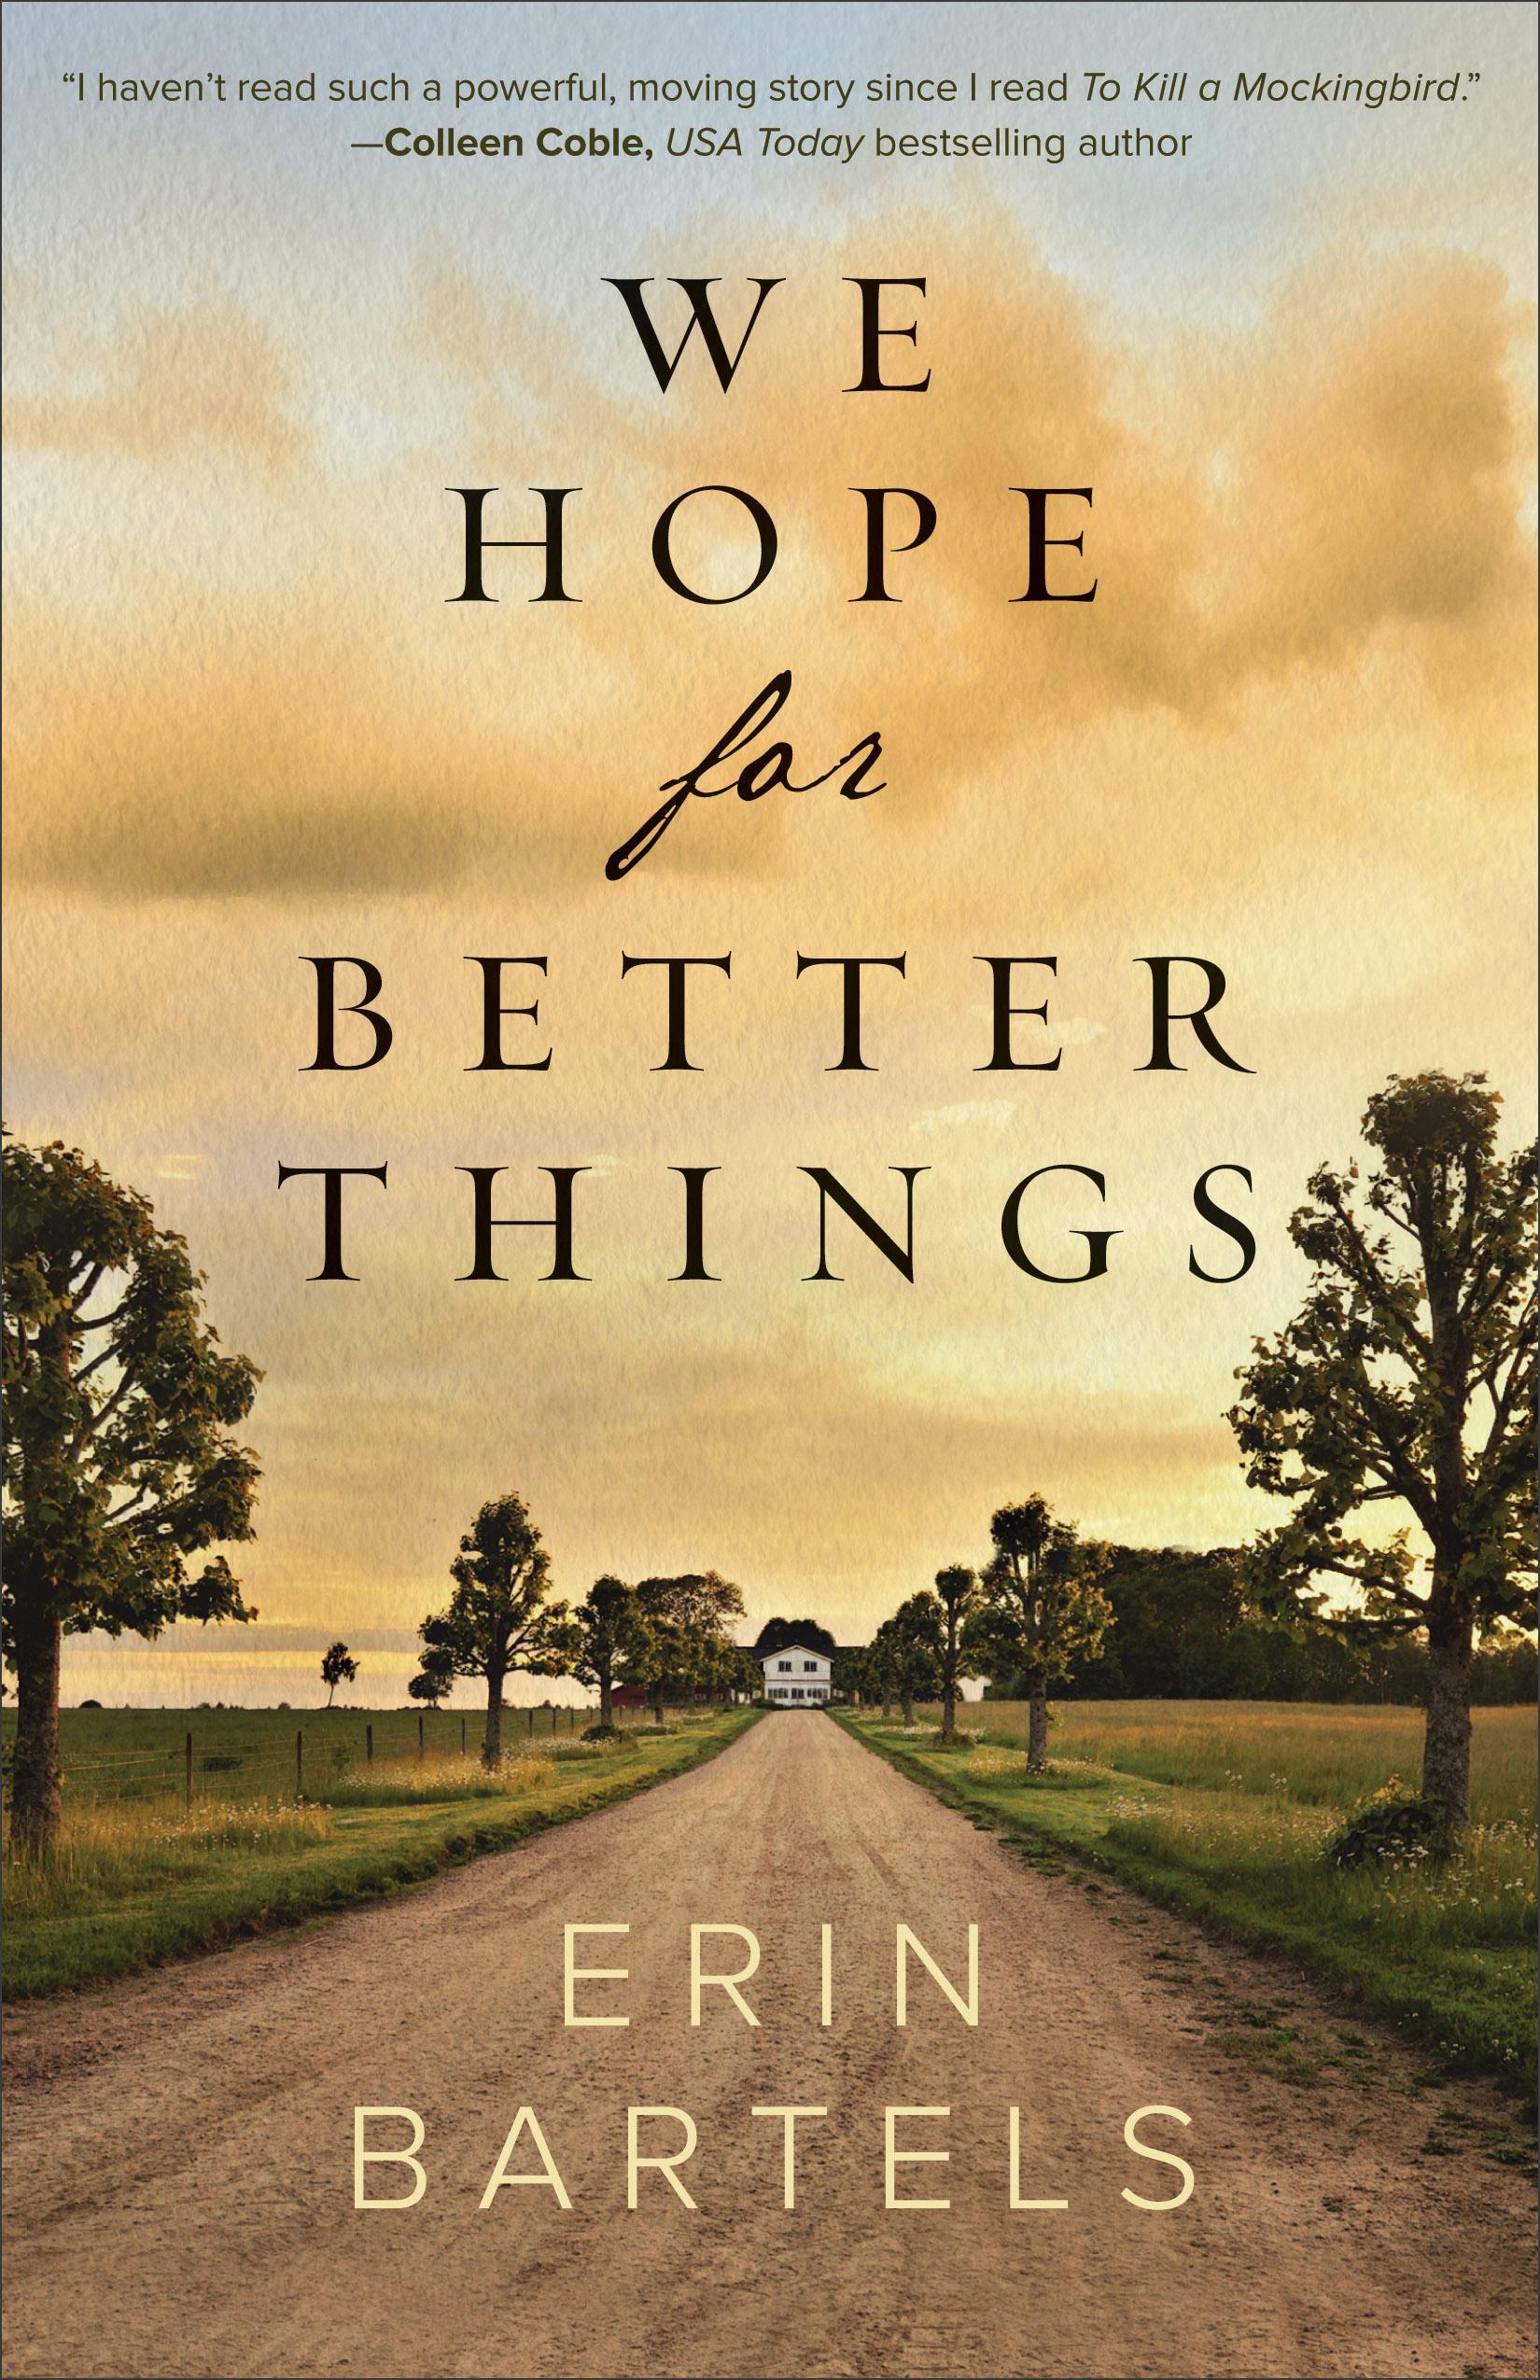 We Hope for Better Things-Book Cover.jpg